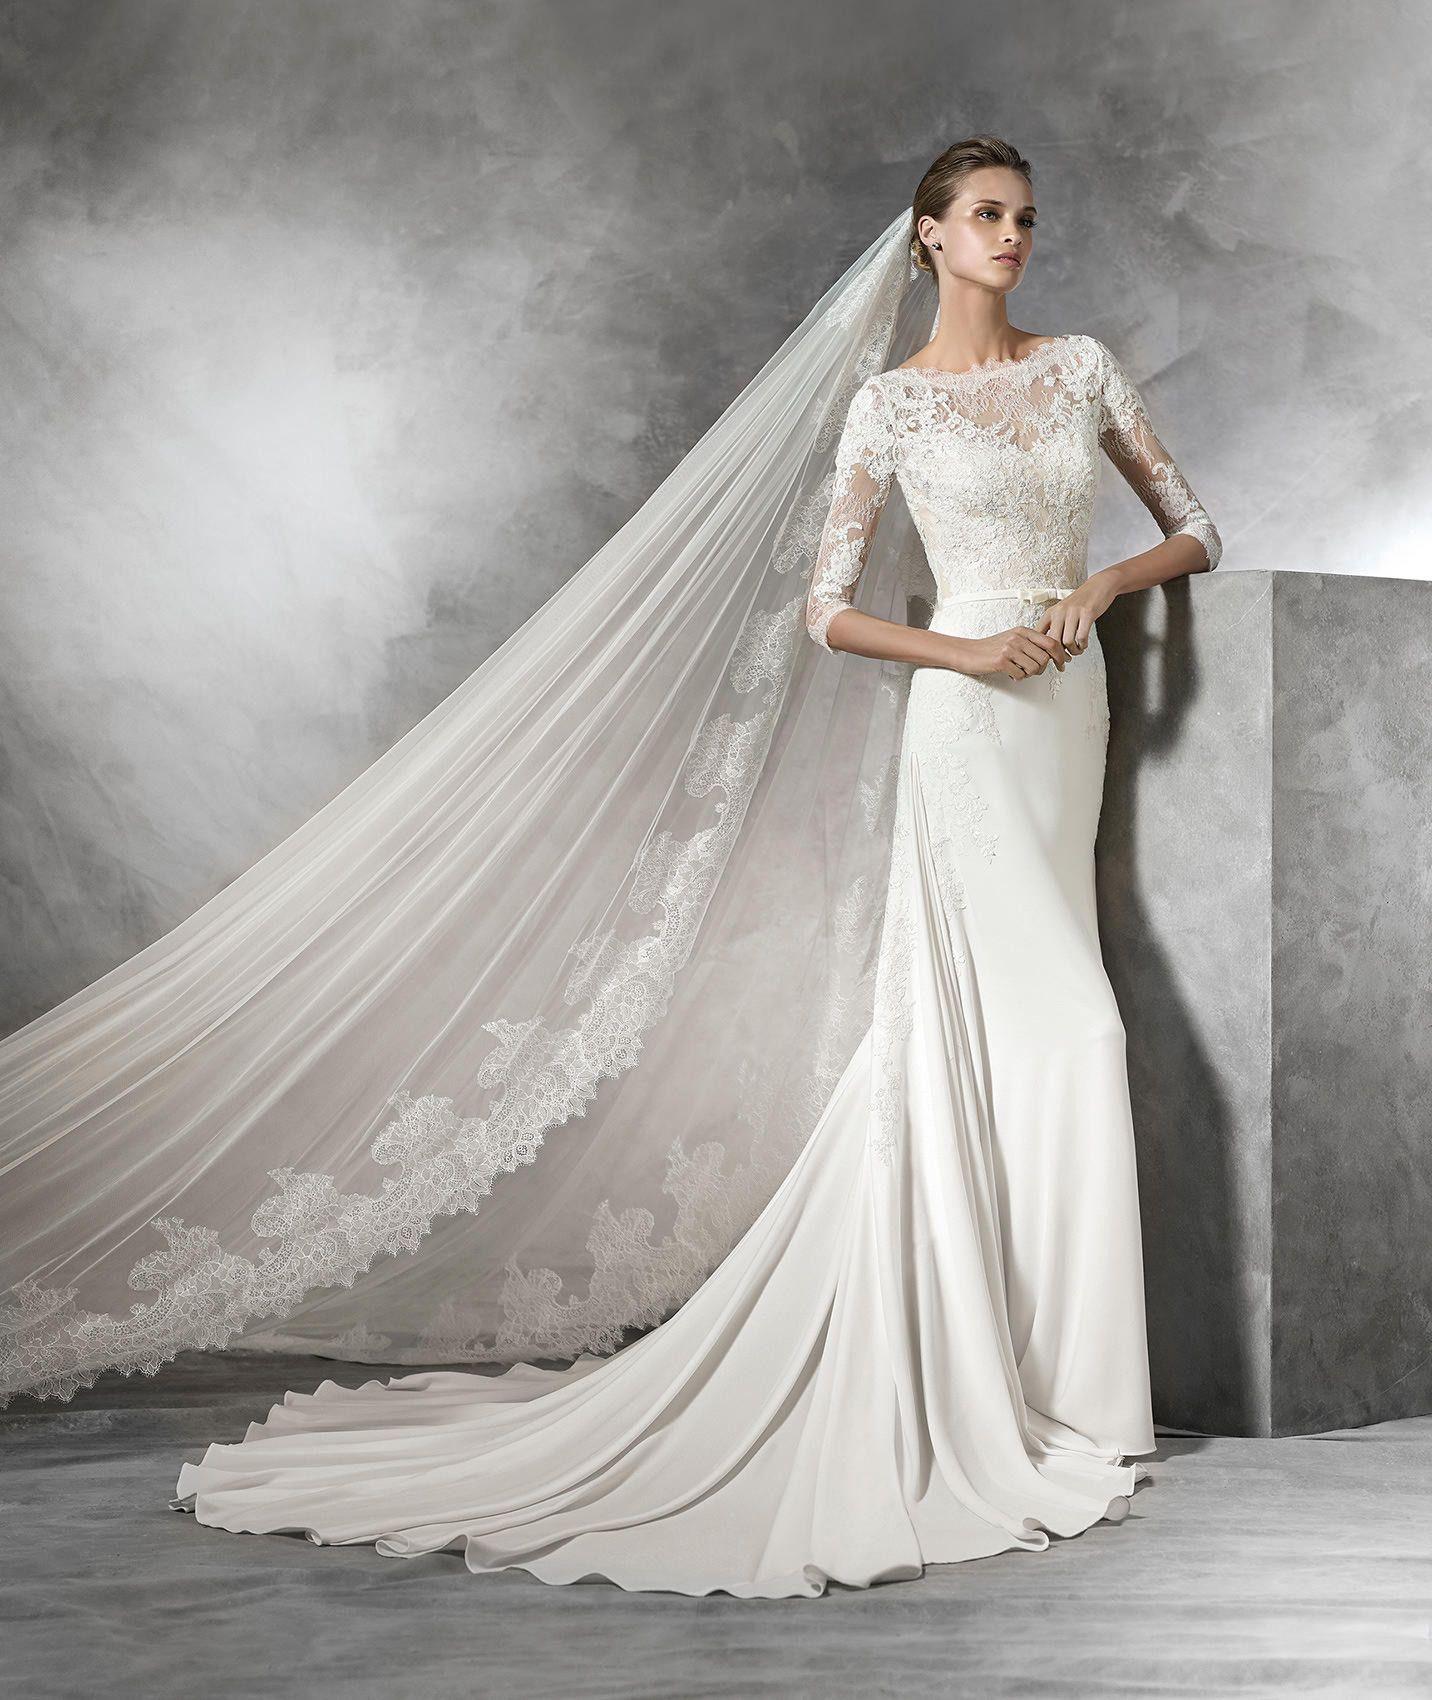 The Perfect Castle Wedding Gowns   Aleana\'s Bridal   dresses ...